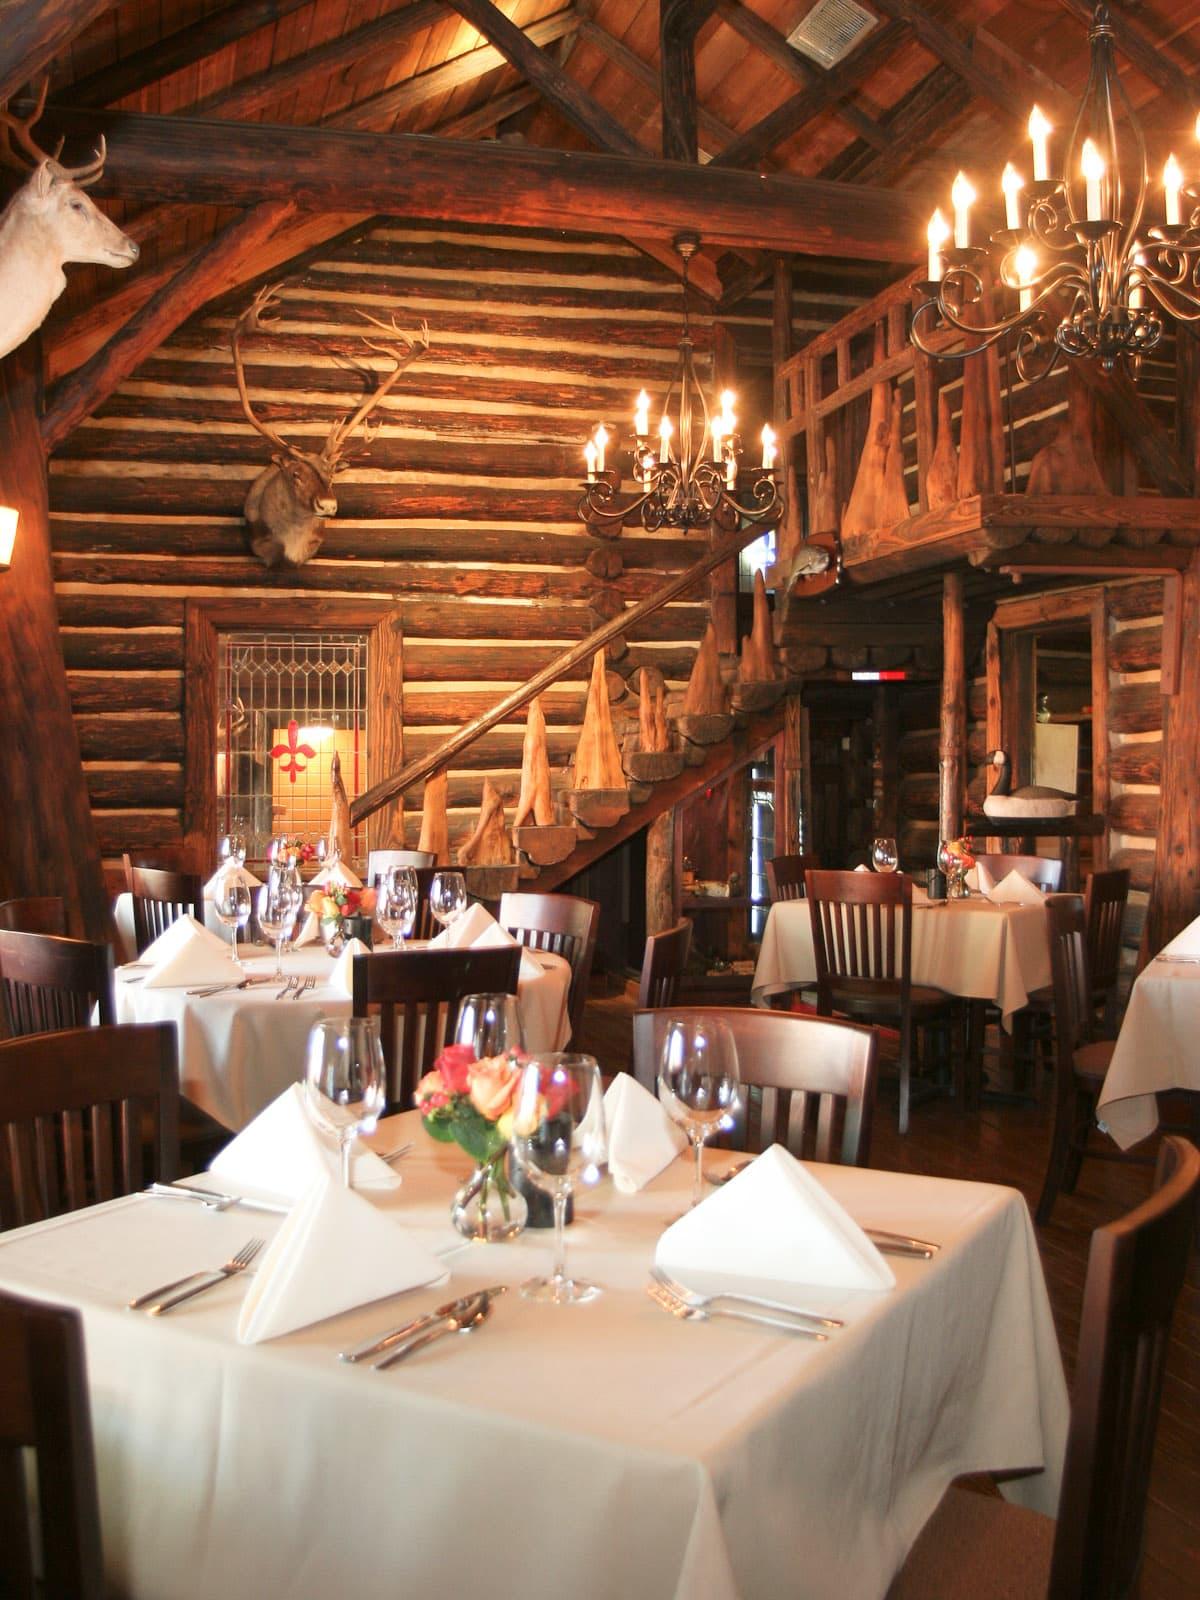 Places-Food-Rainbow Lodge restaurant interior